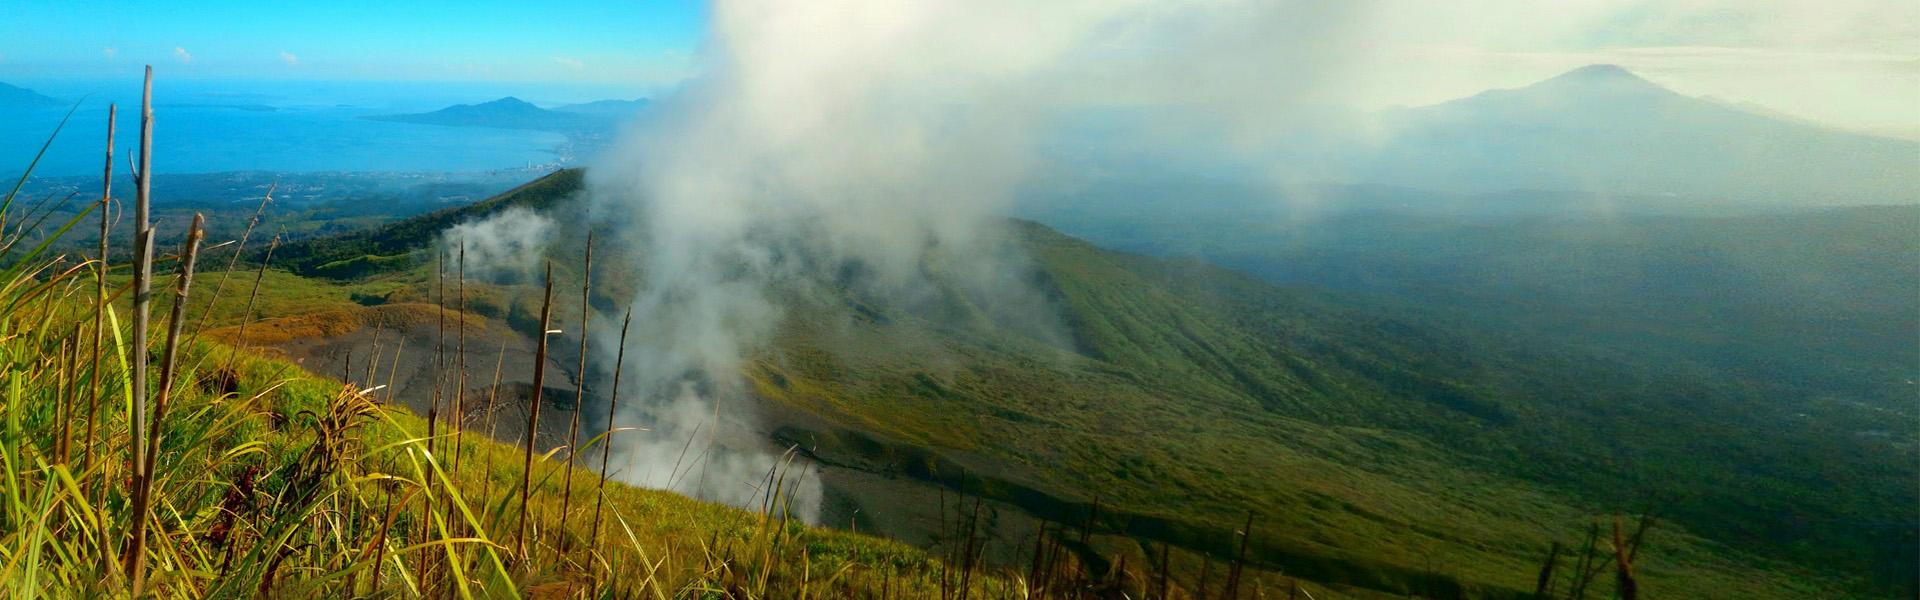 Tompaluan crater in the Mt Lokon-Empung volcanic complex